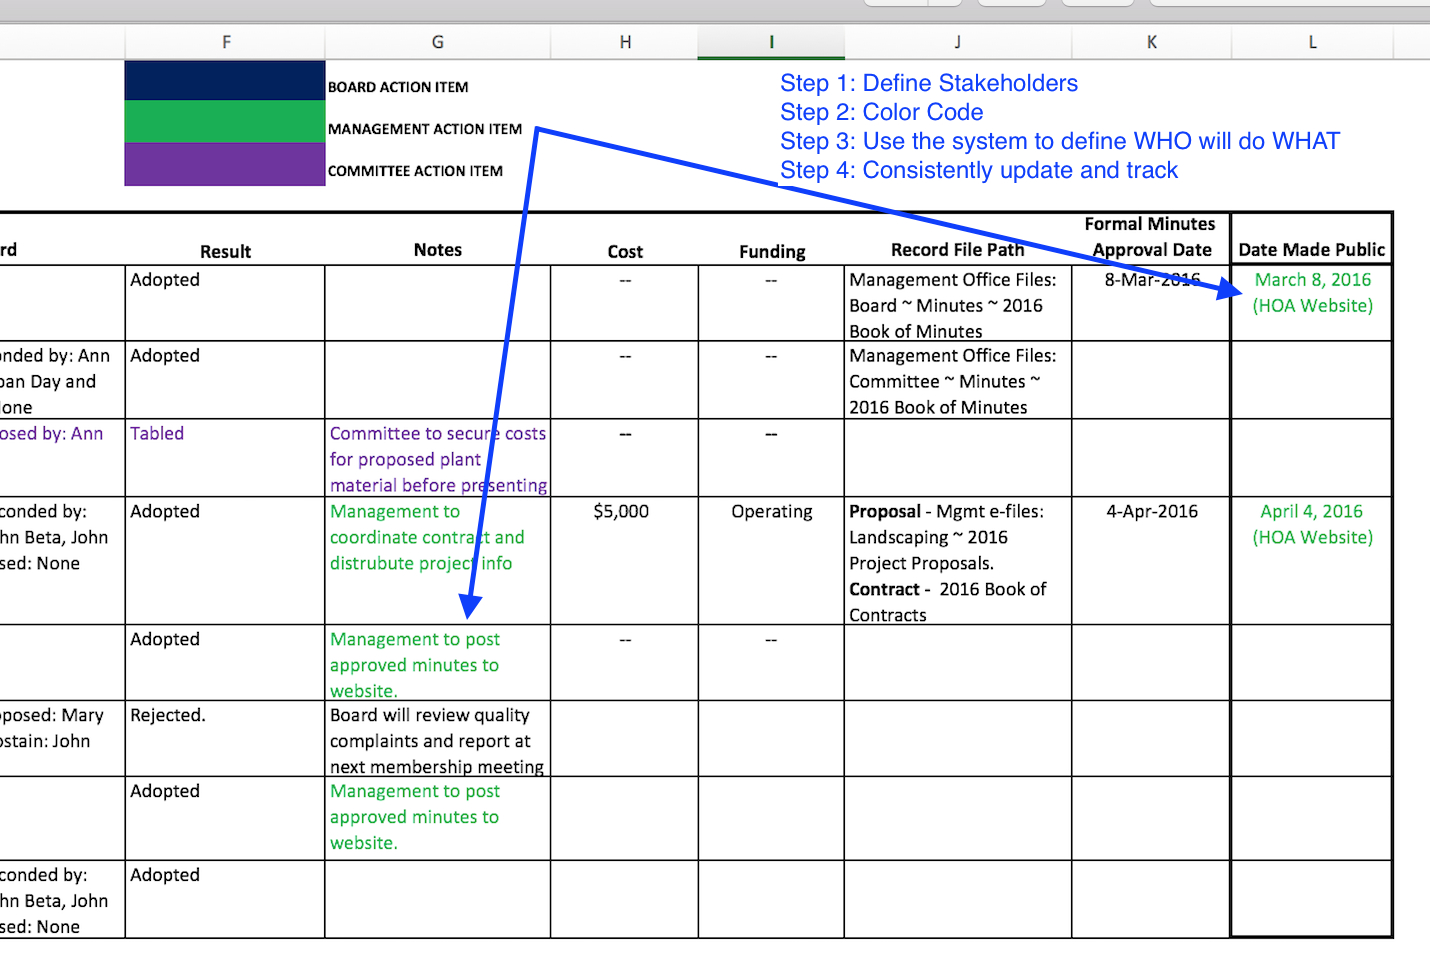 Hoa Reserves Spreadsheet Inside Avoiding Hoa Meeting Déjà Vu  Gladly